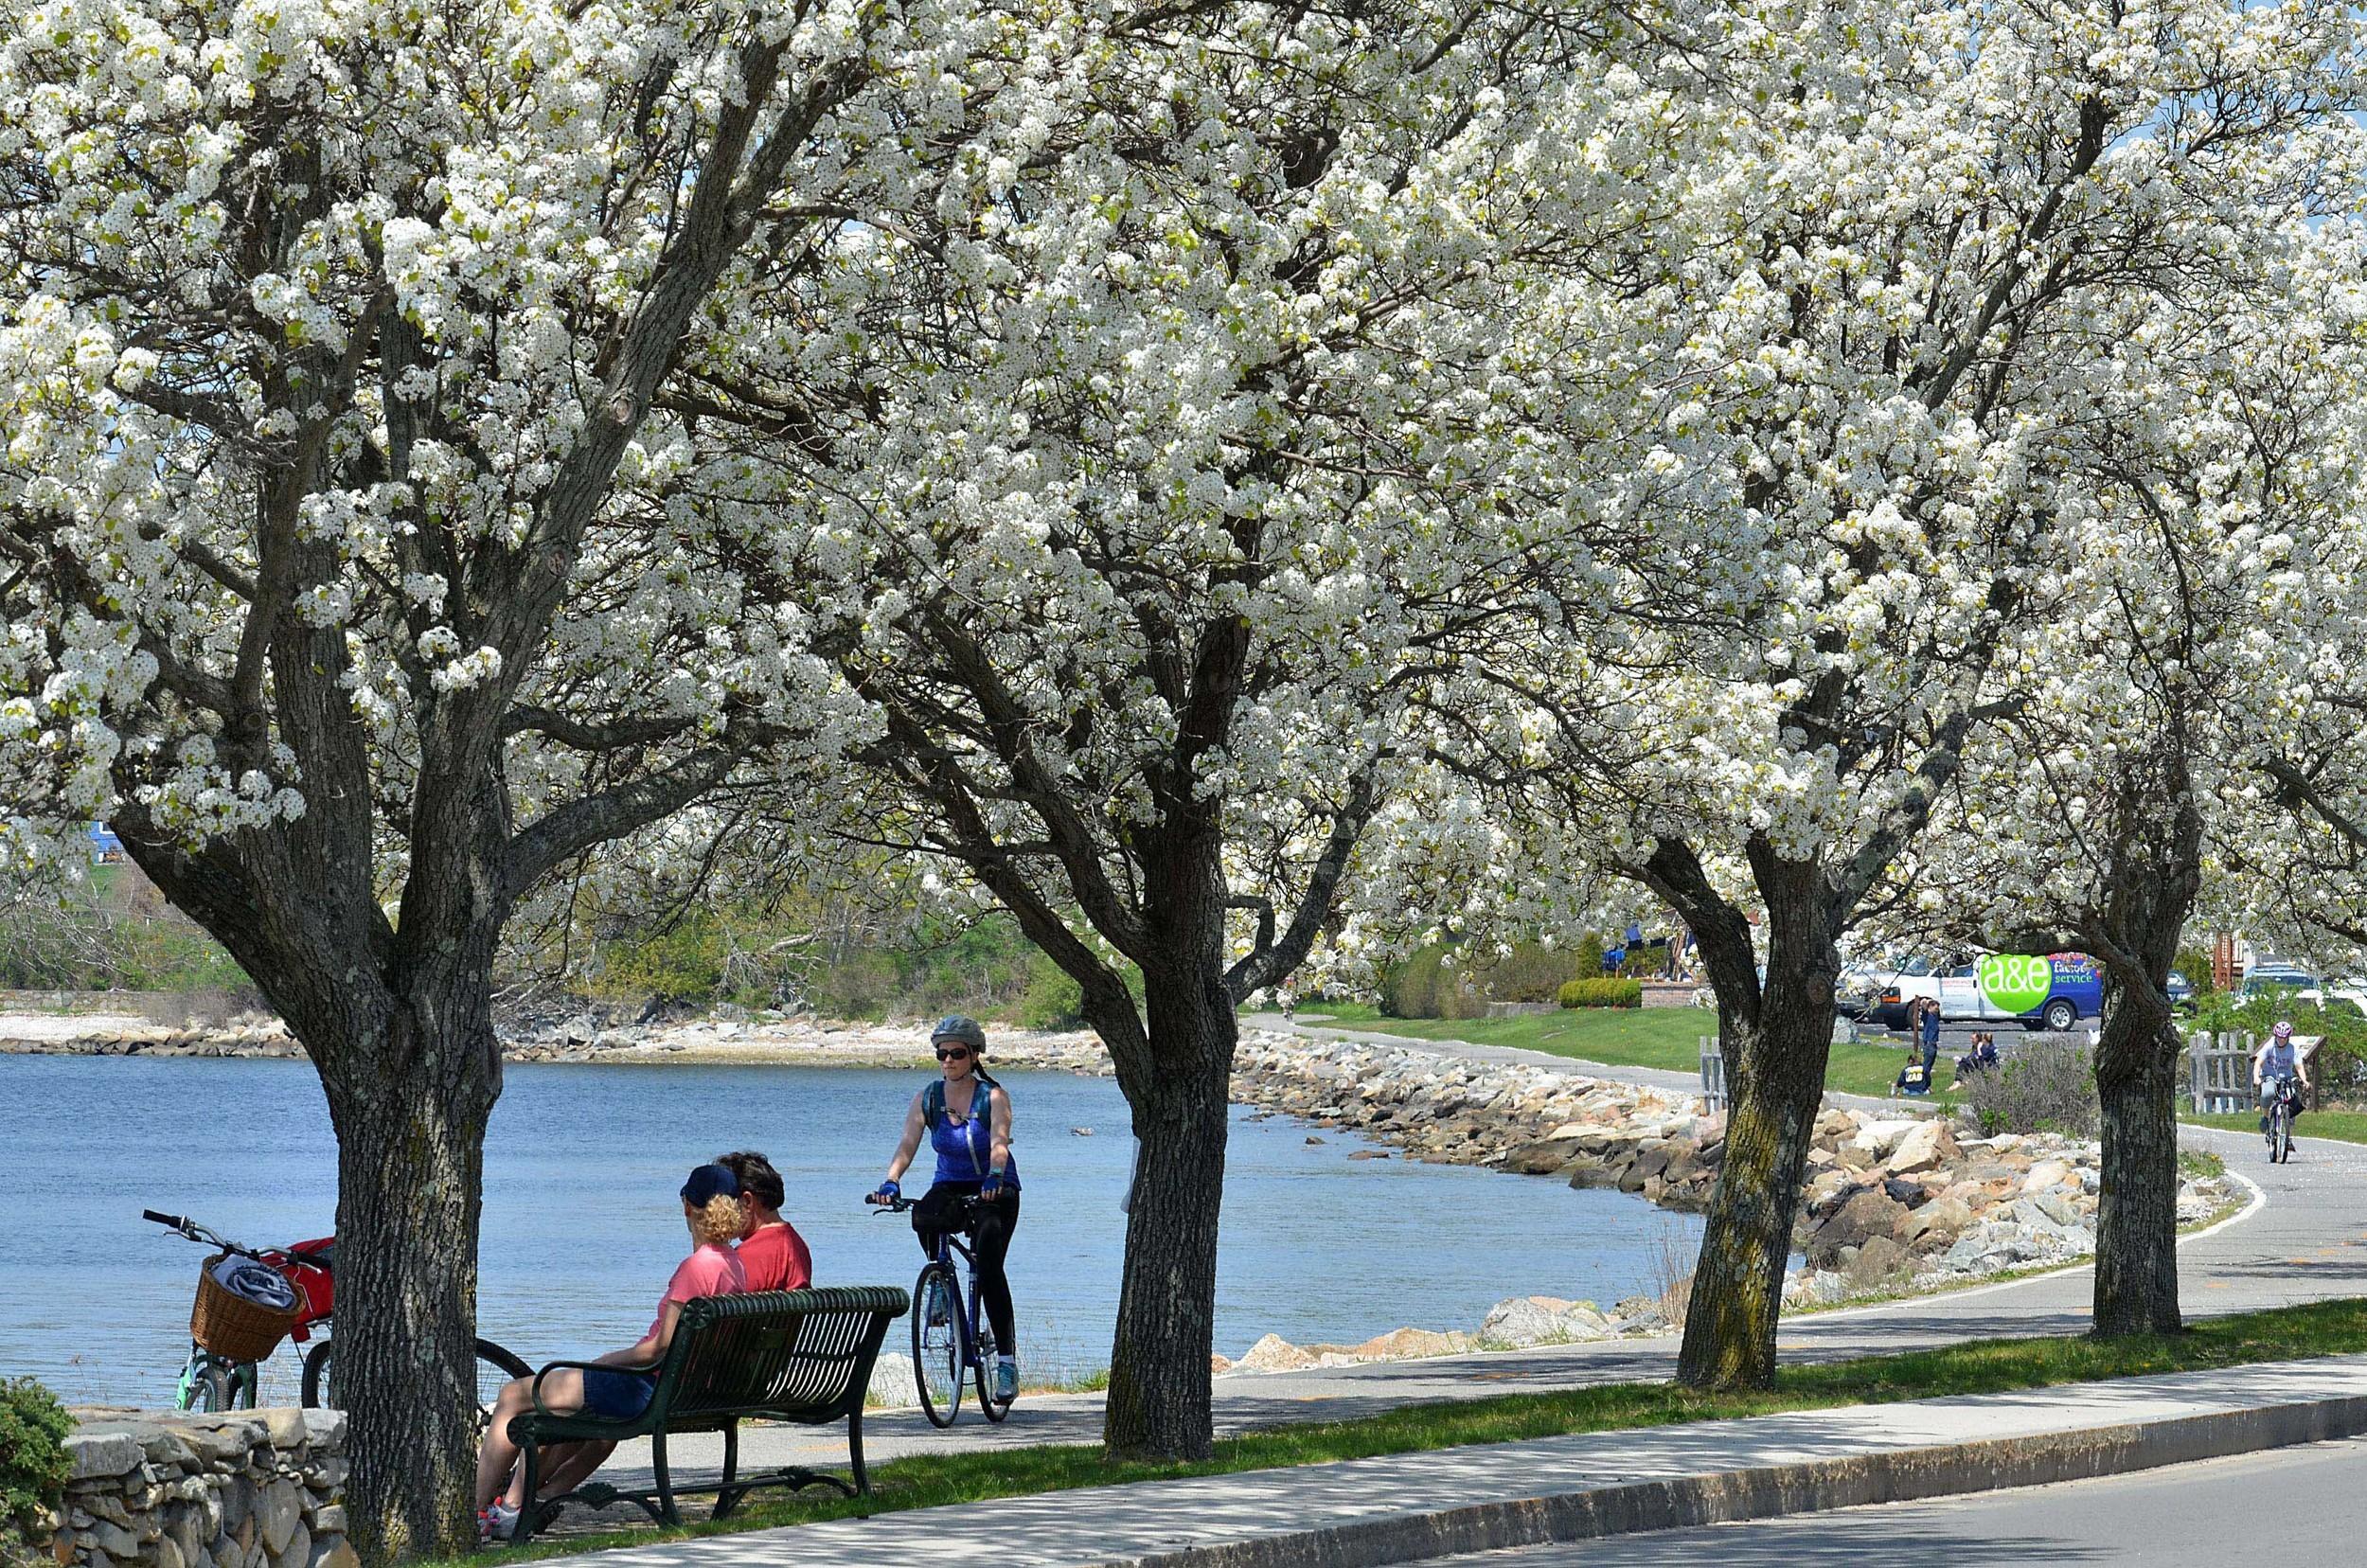 Most scenic' designation could help boost tourism to Bristol   RhodyBeat